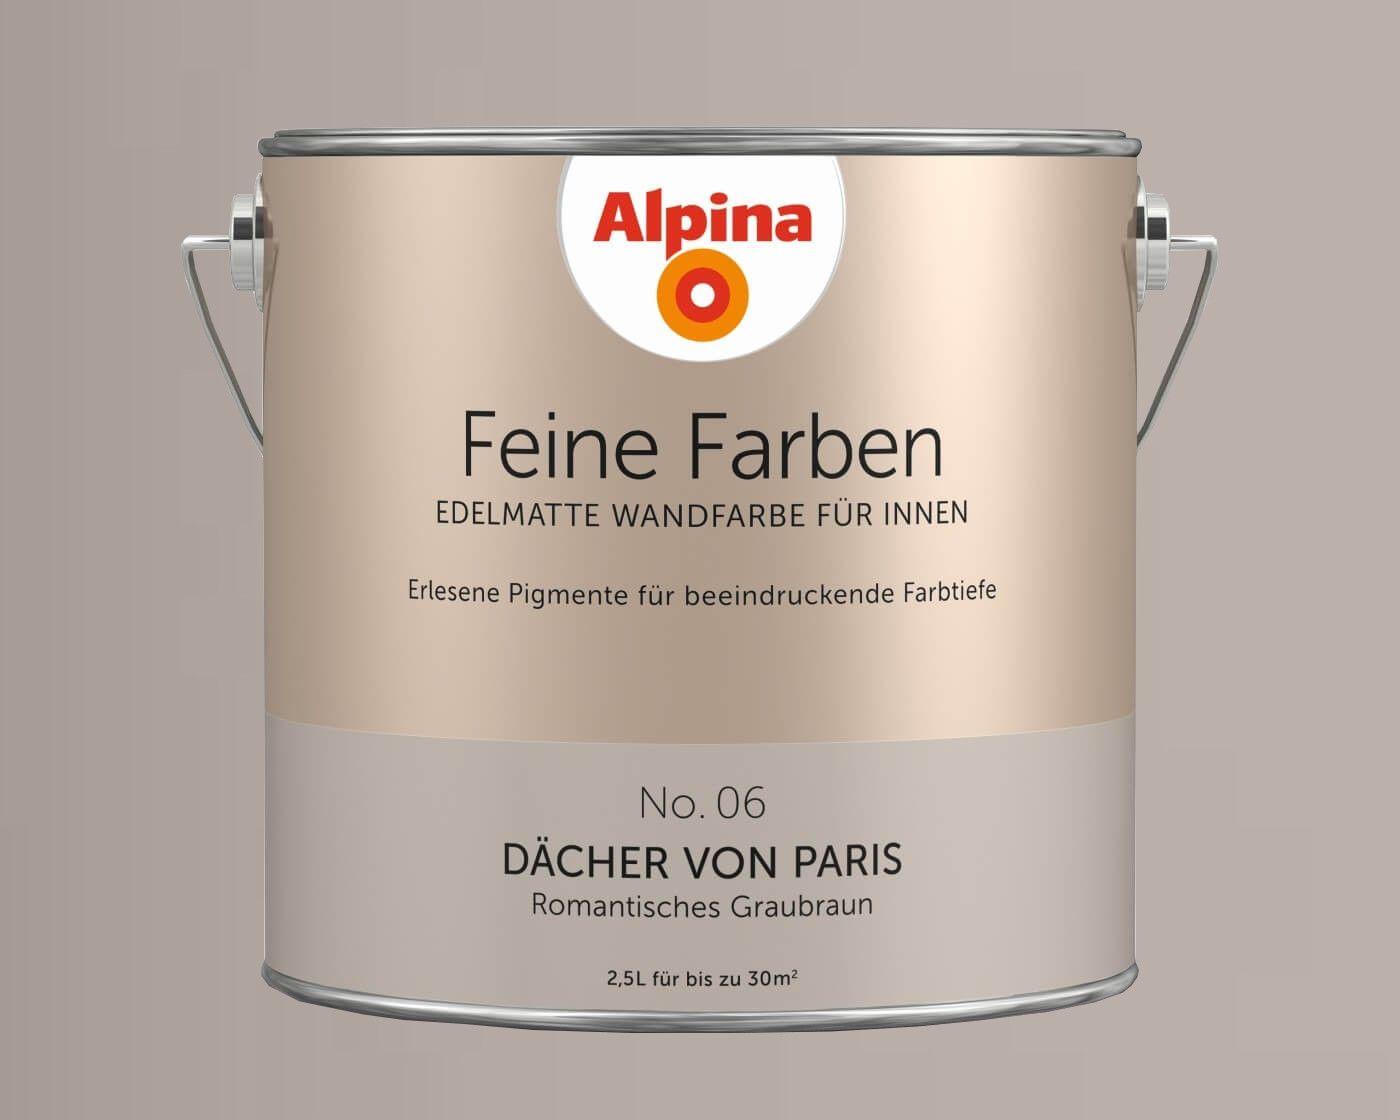 Alpina Feine Farben - Edelmatte Wandfarbe für Innen, alle Farbtöne, 2,5L Dose